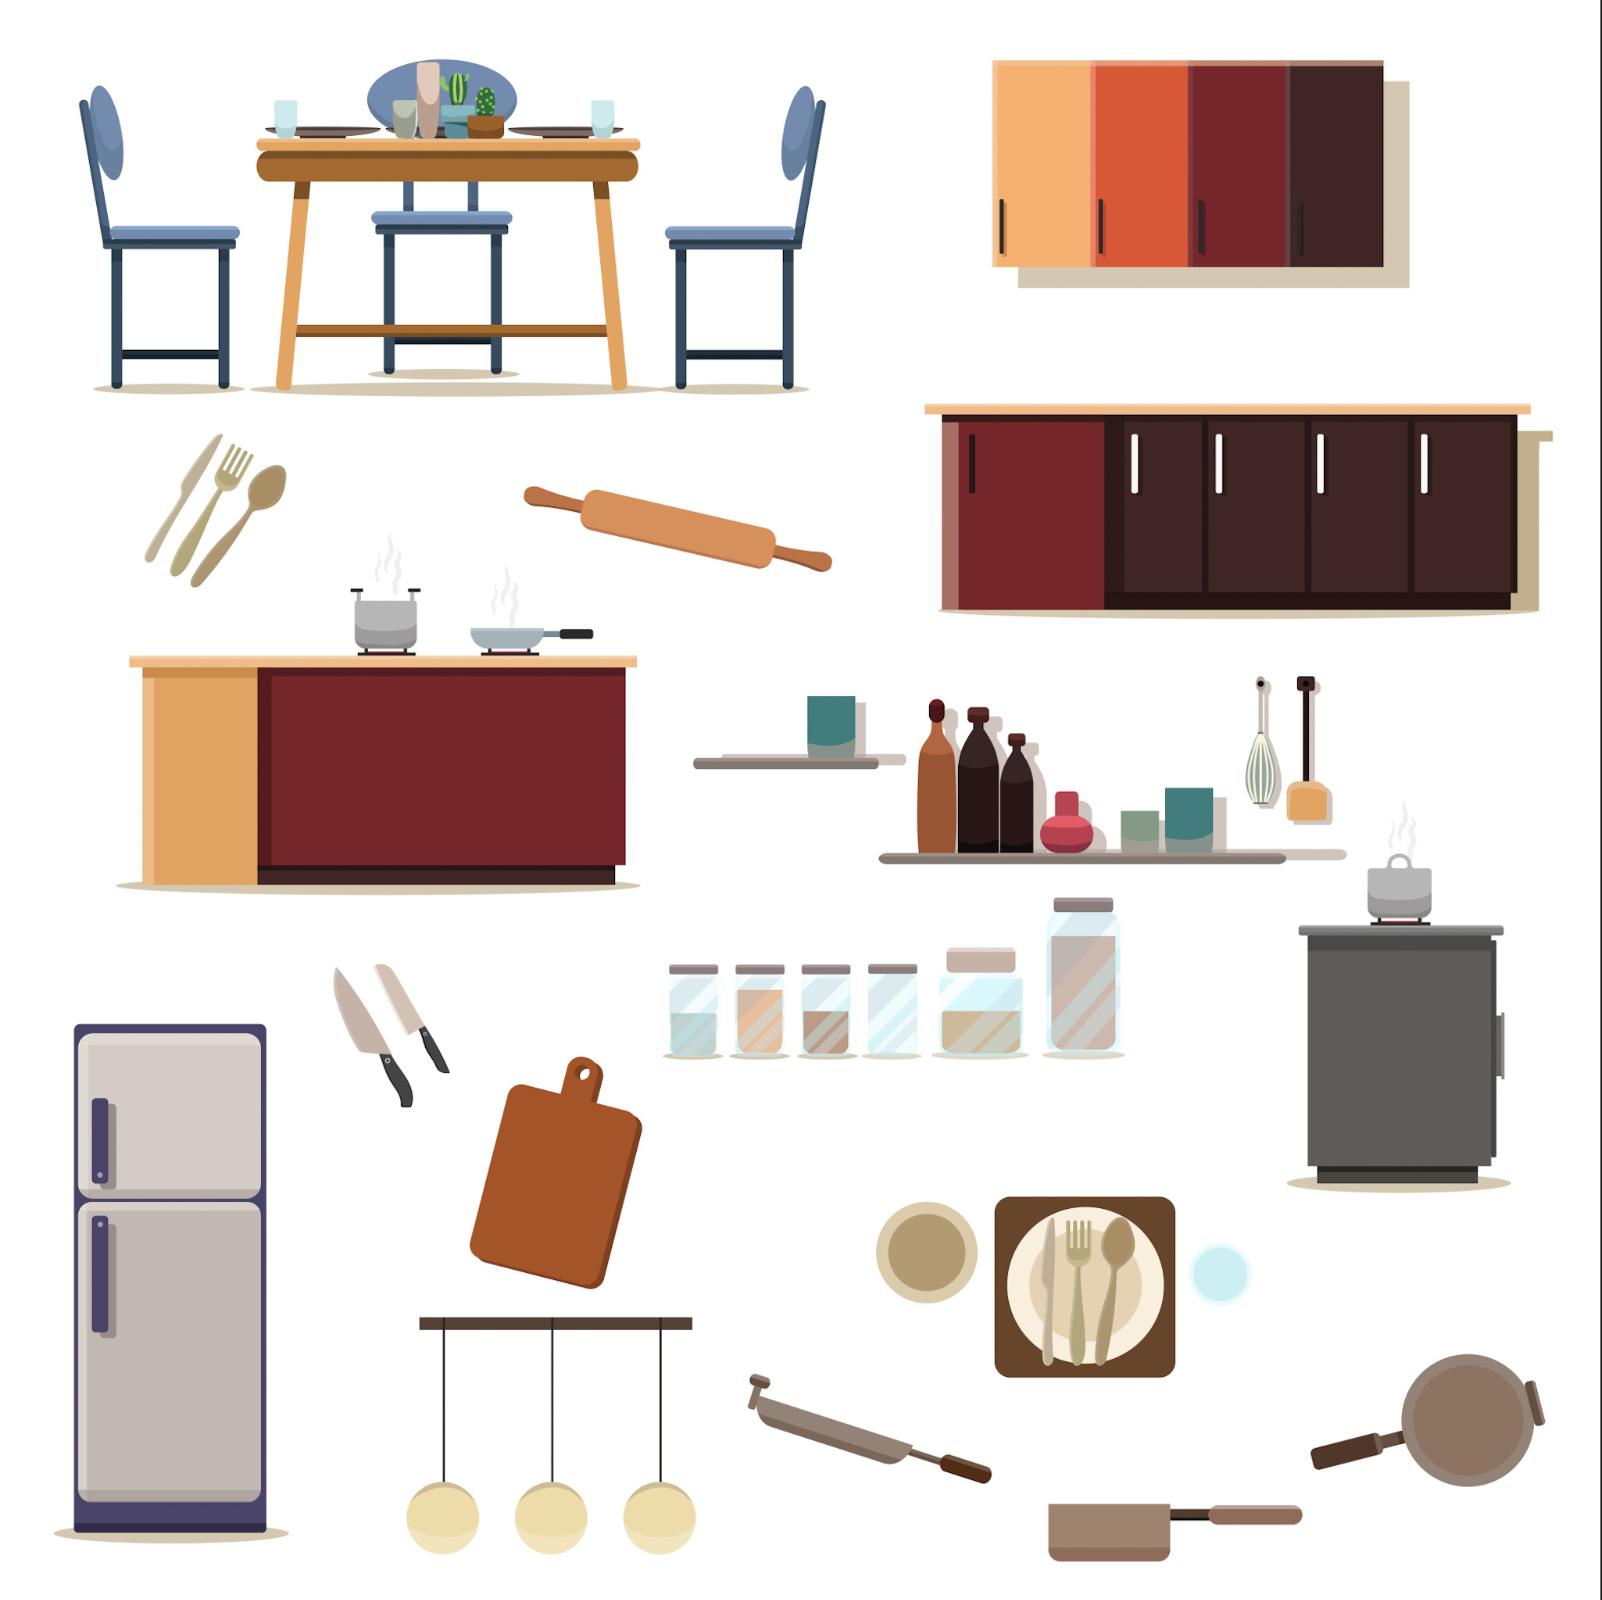 Set Of Kitchen Decoration Of Kitchen Room Download Free Vectors Clipart Graphics Vector Art